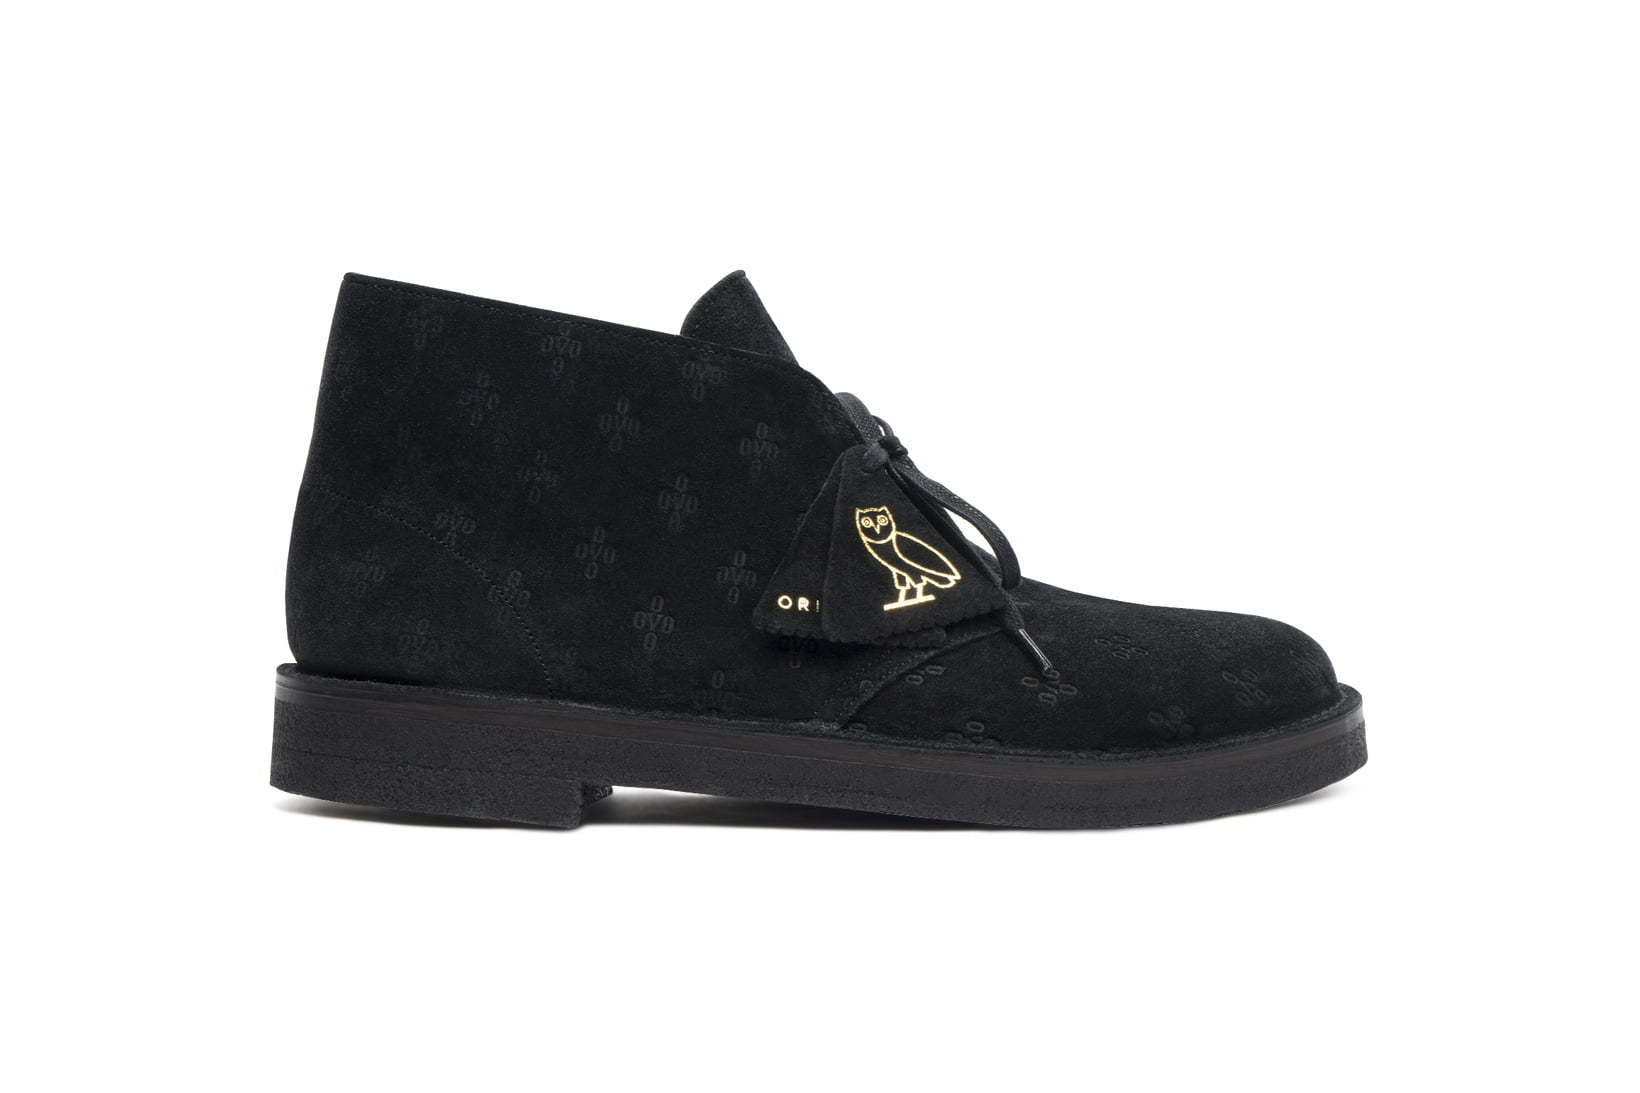 Drake Ovo Shoe Sales